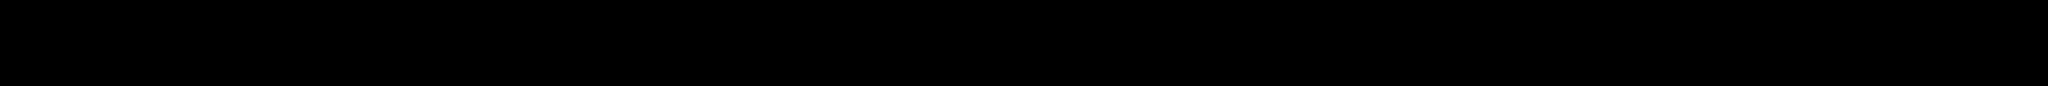 LIQUI MOLY P000193 Reiniger, Dieseleinspritzsystem